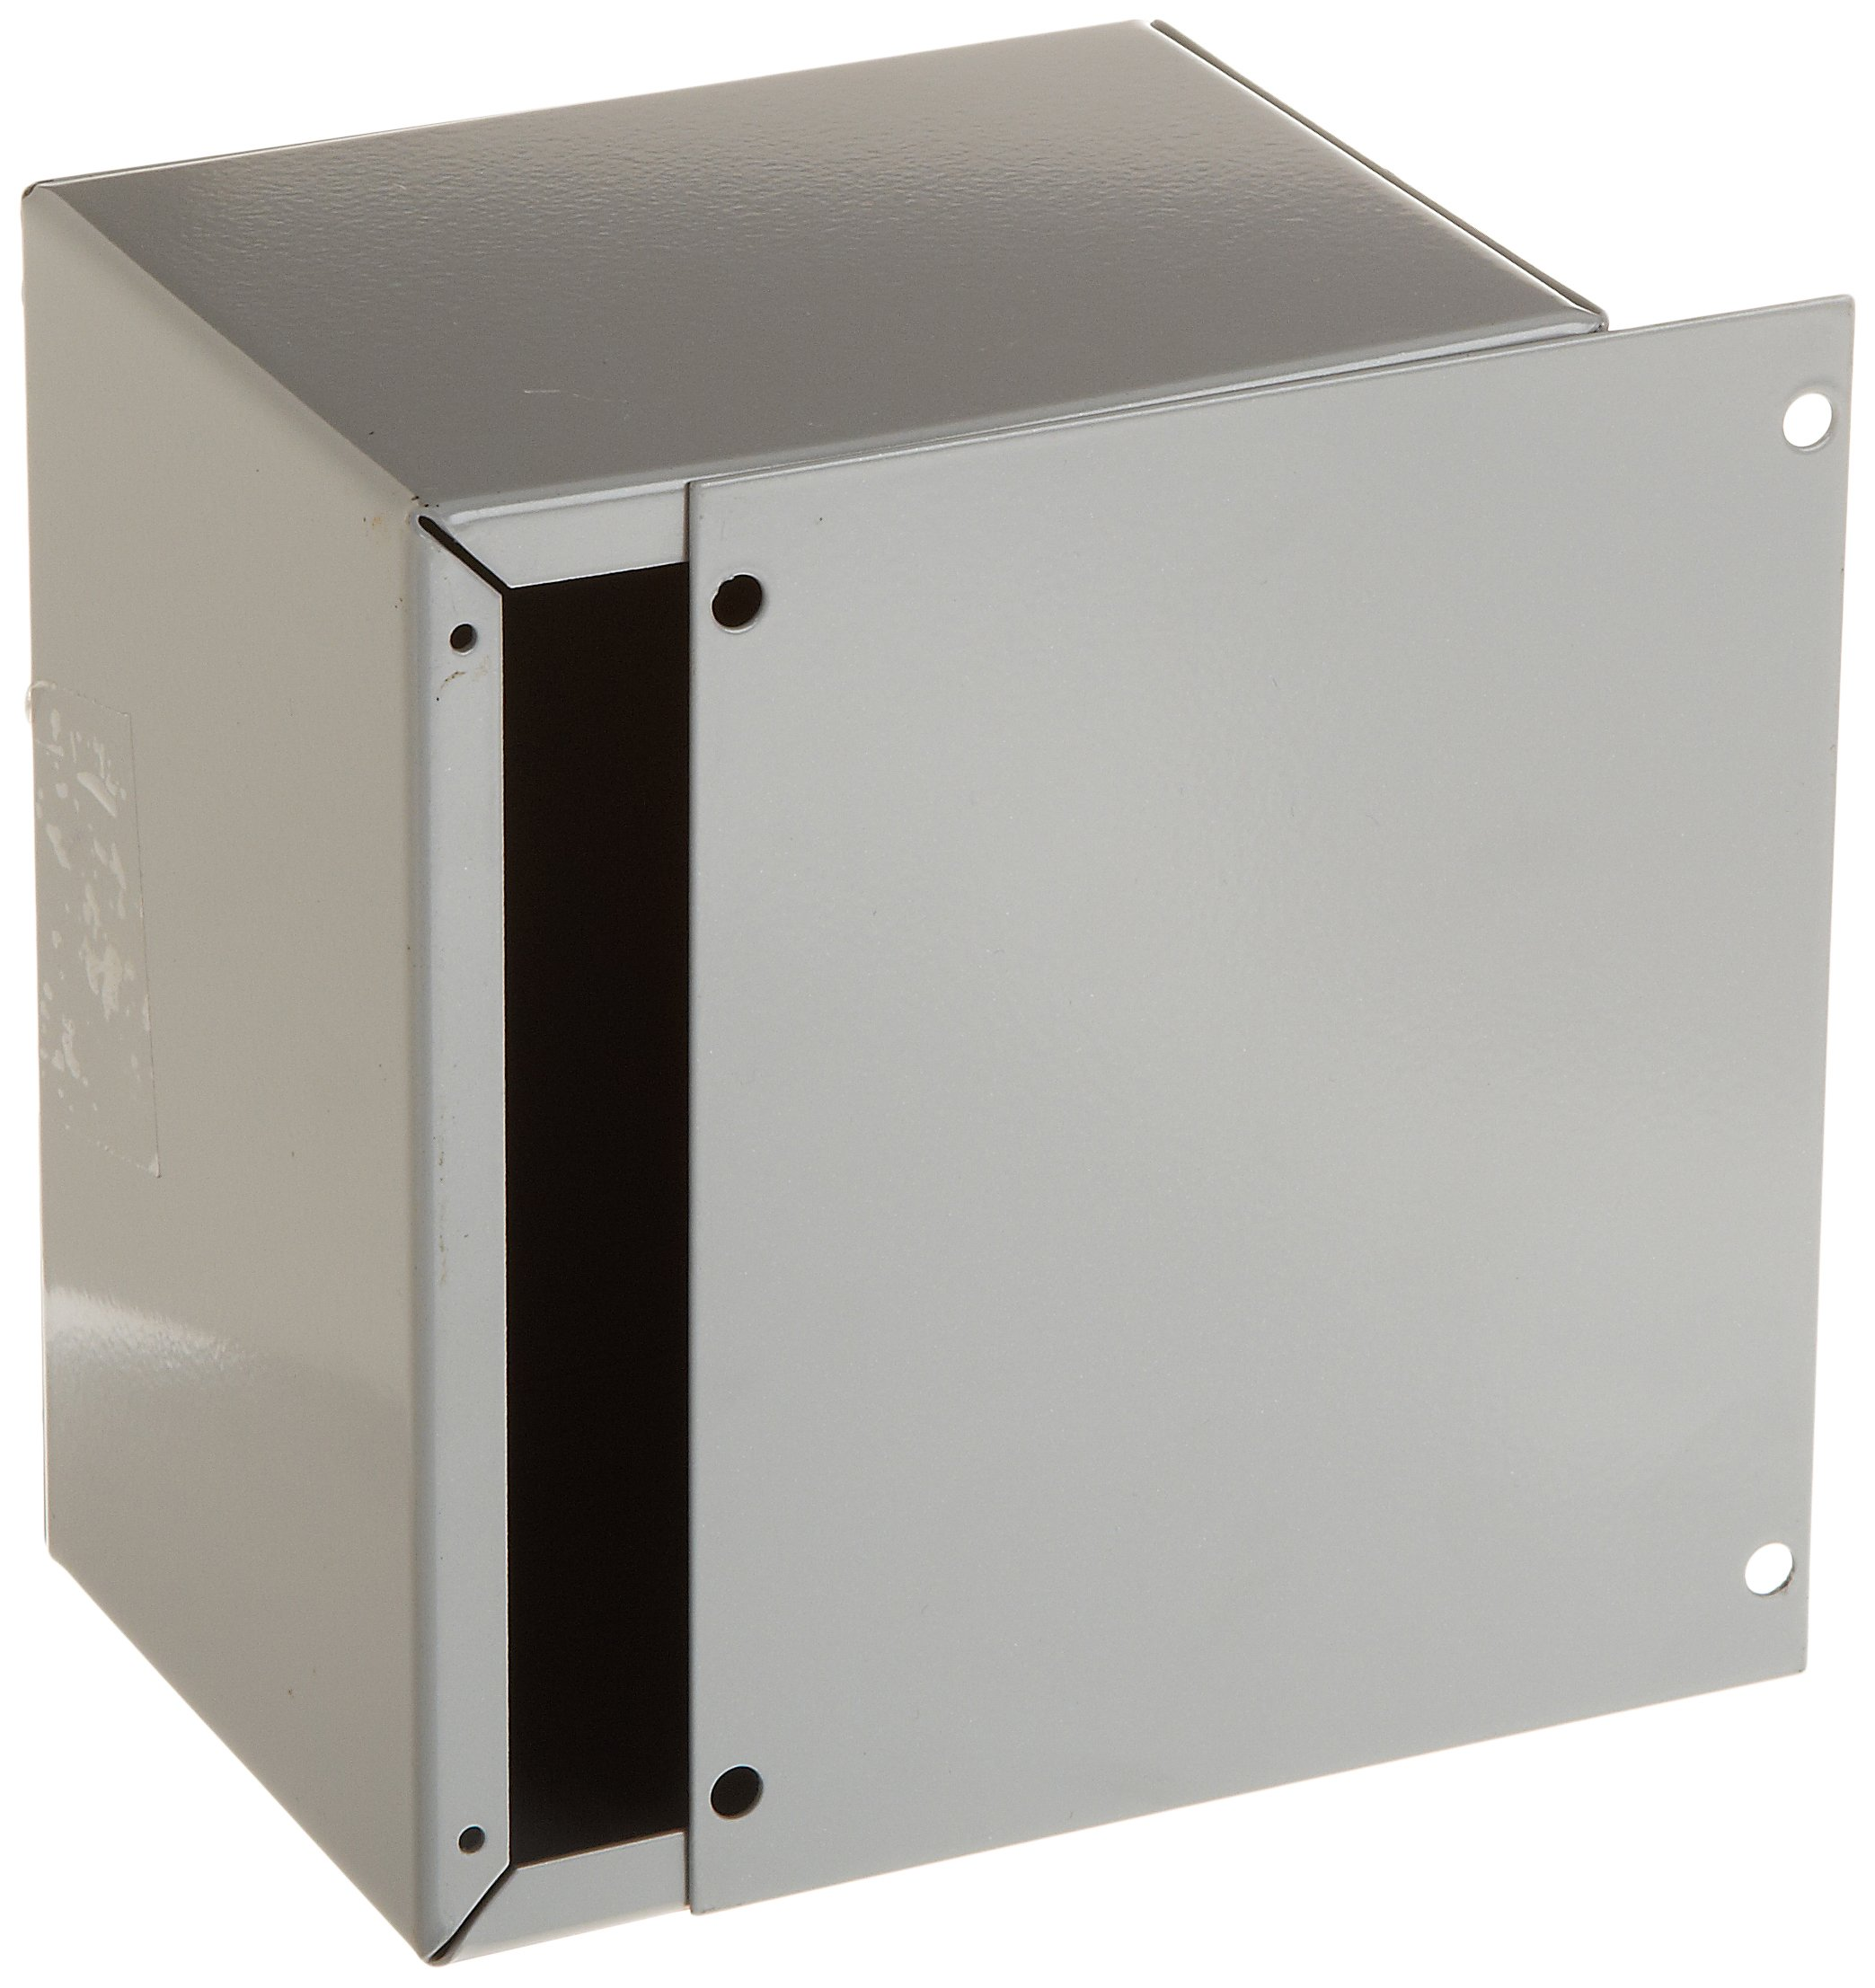 BUD Industries CU-729 20 Gauge Steel Utility Cabinet, 6'' Width x 5'' Height x 4'' Depth, Metallic Gray Finish